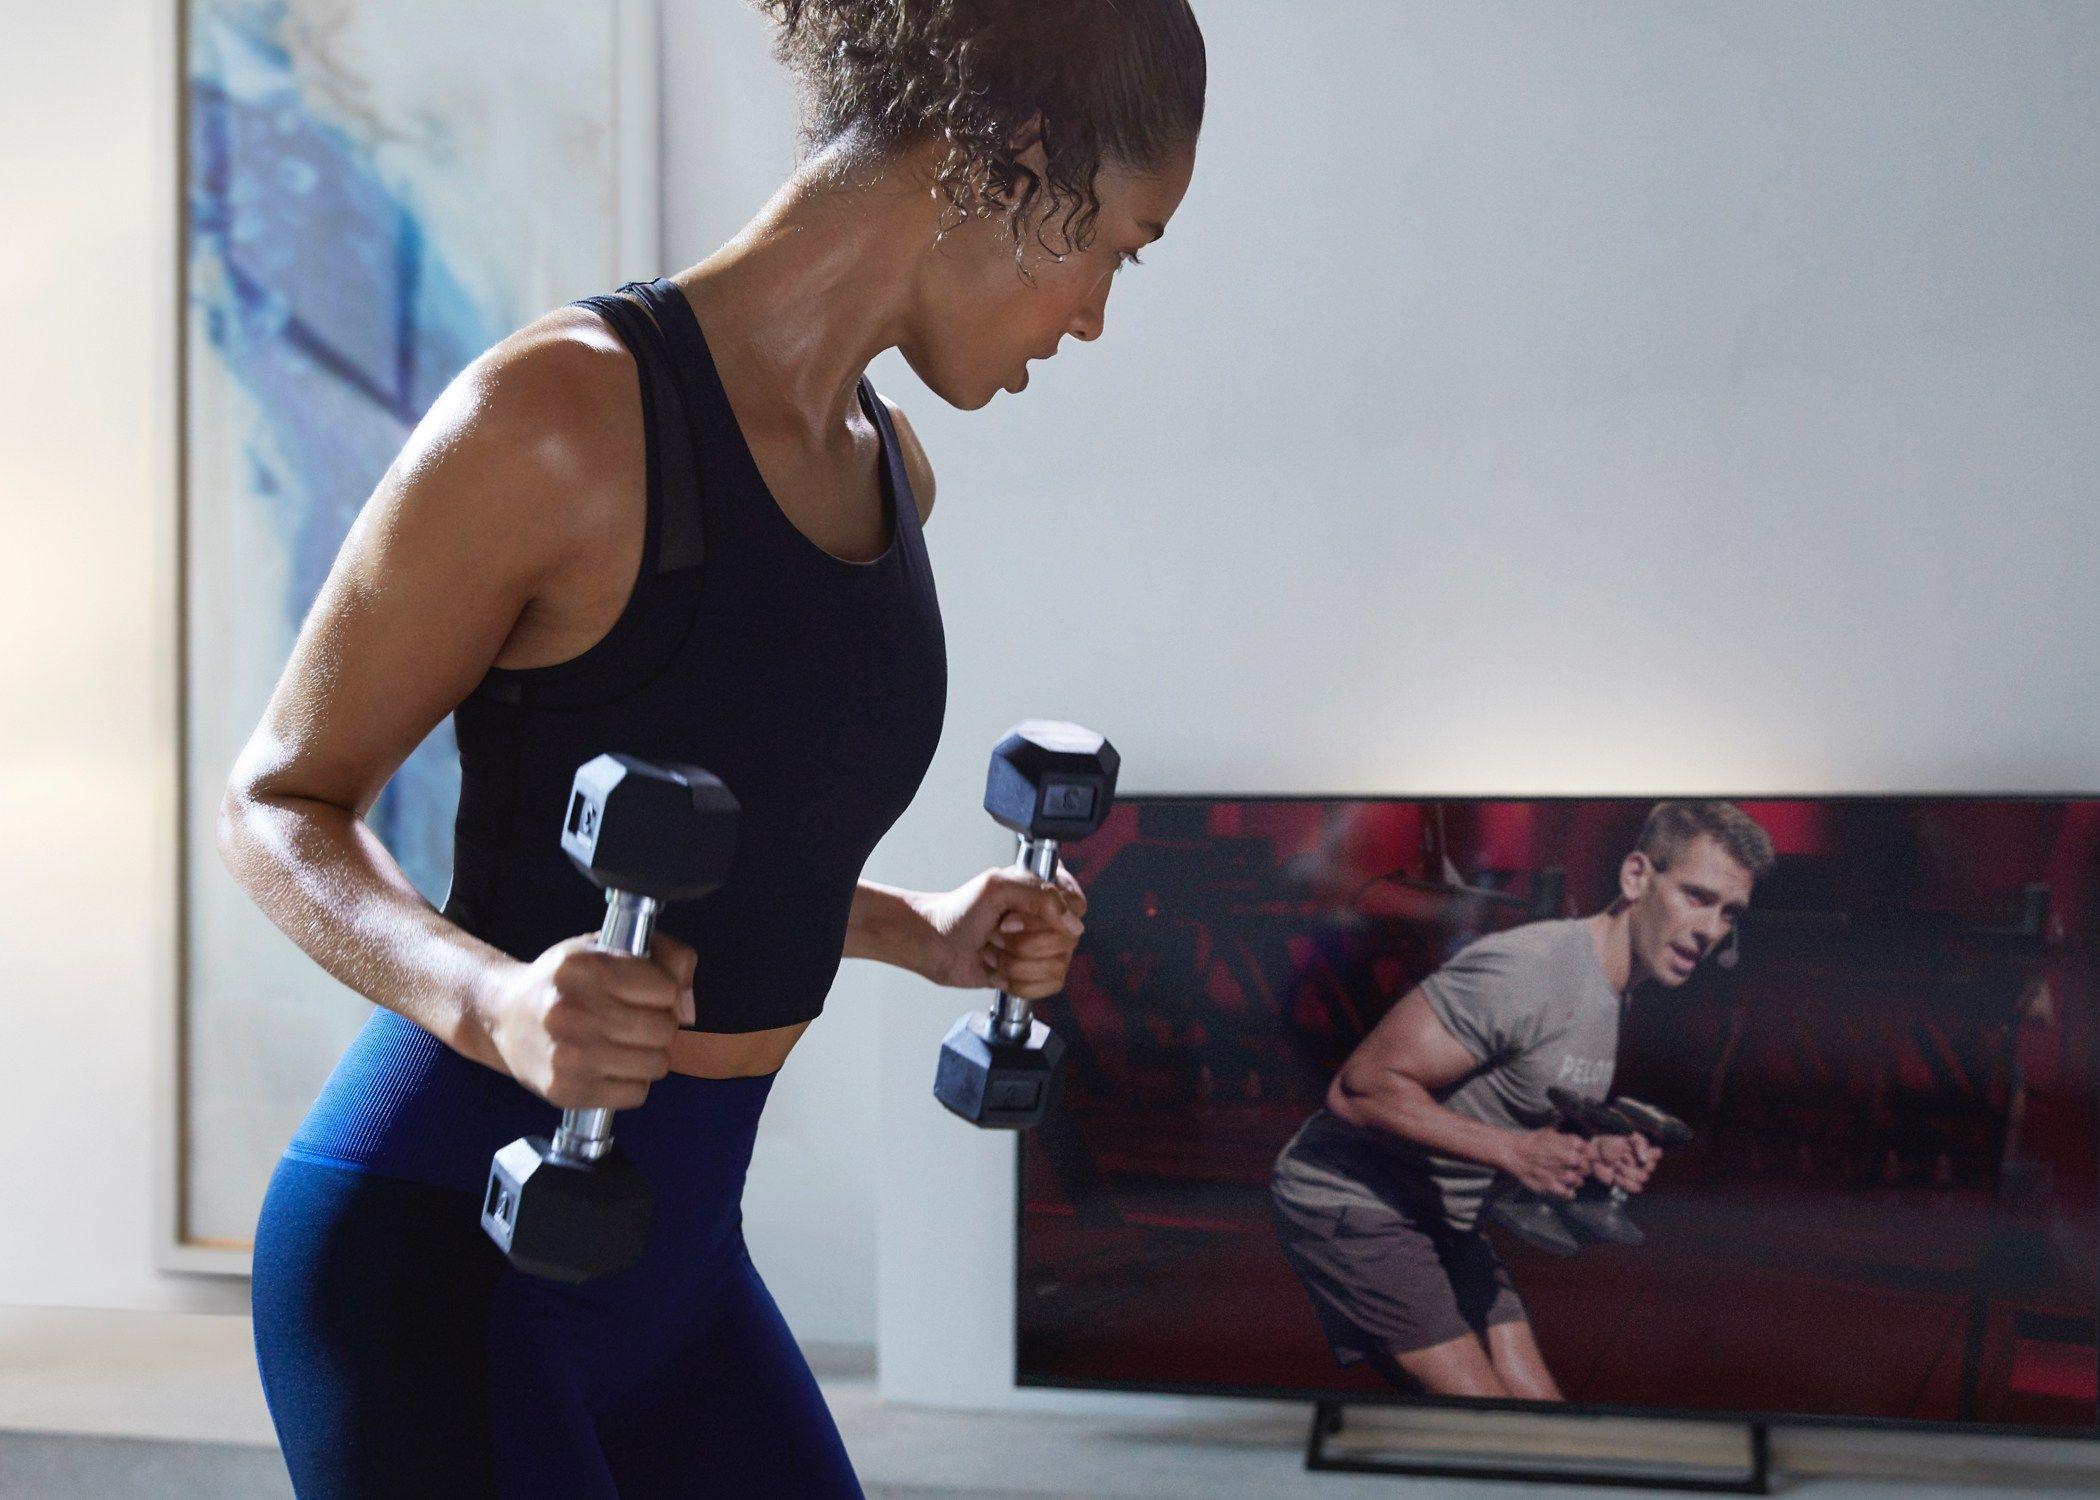 Home exercise coming back peloton digital app 10000